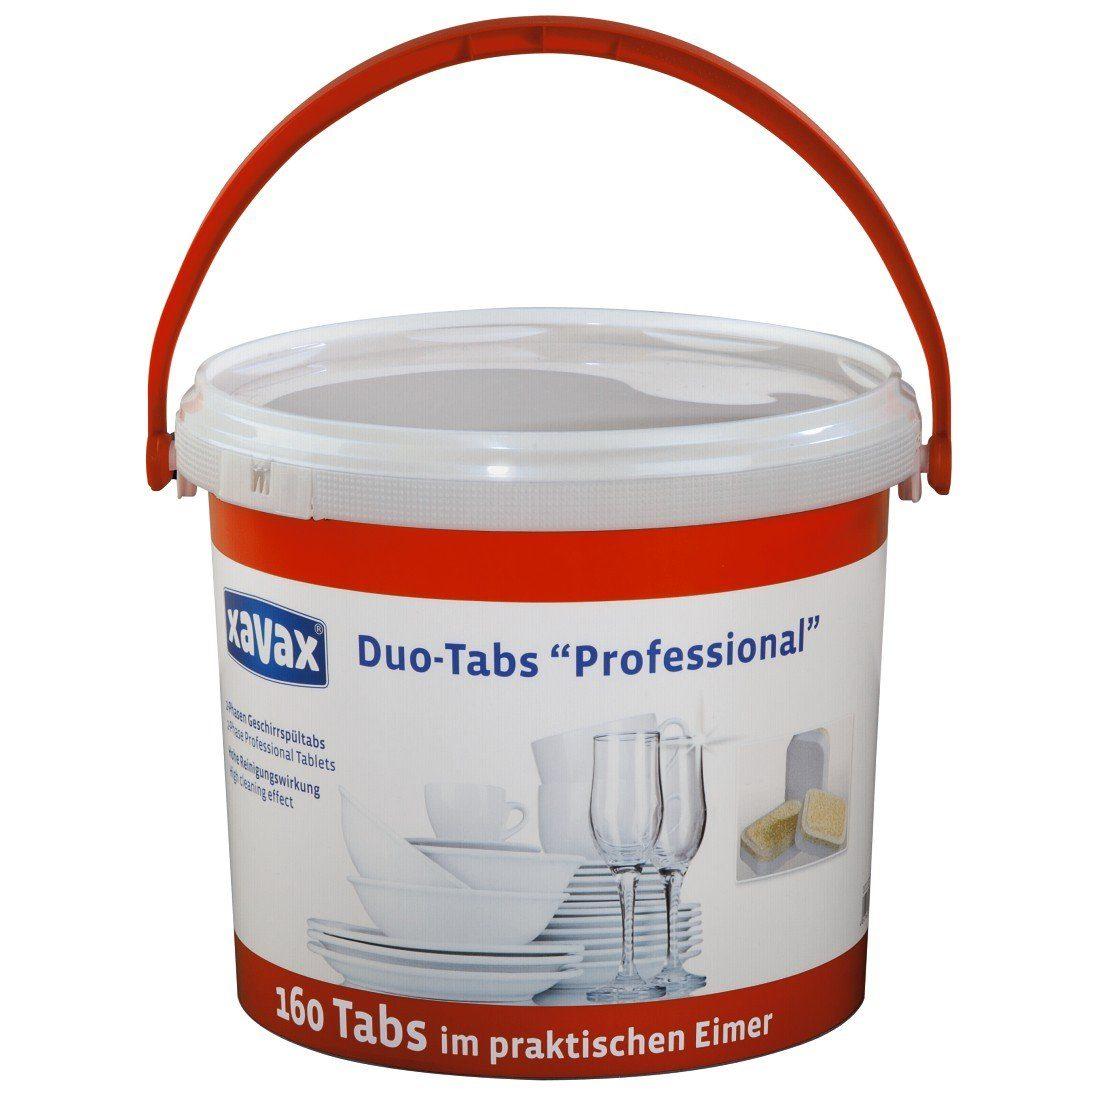 Xavax 2-Phasen-Profi-Tabs für Geschirrspülmaschinen, 160 im Eimer »Geschirrspültabs, Spültabs«